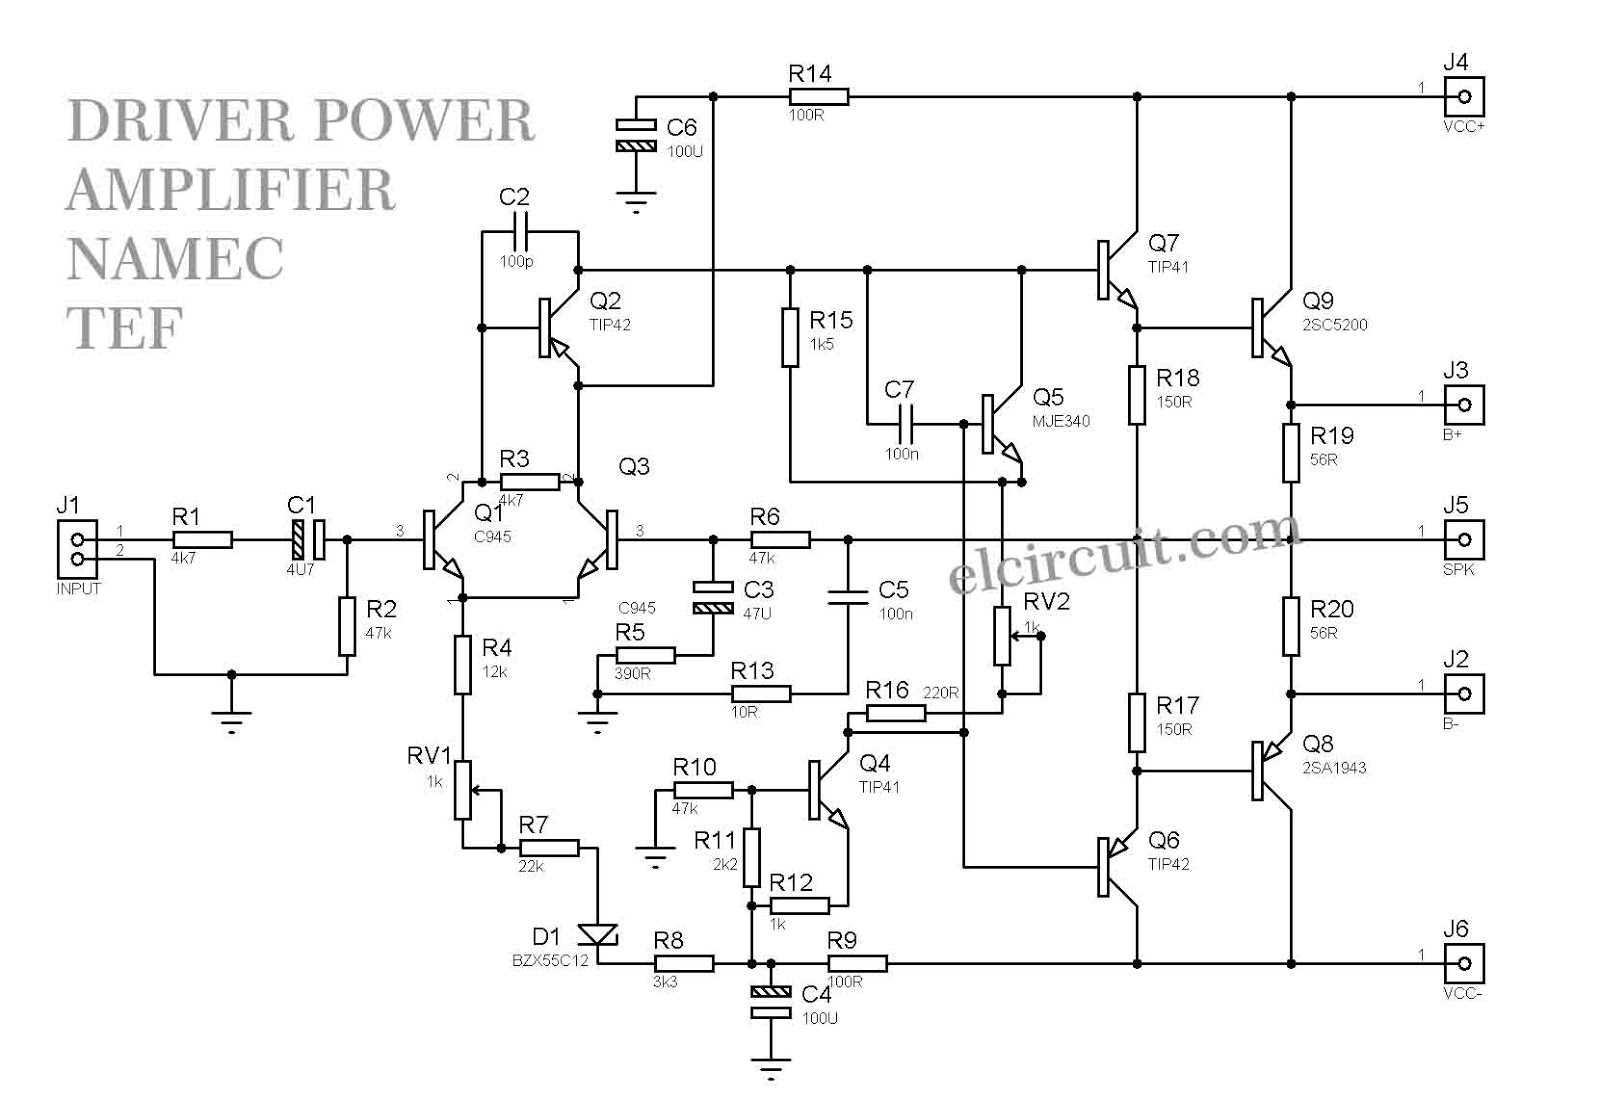 medium resolution of circuit diagram schematic driver power amplifier namec tef